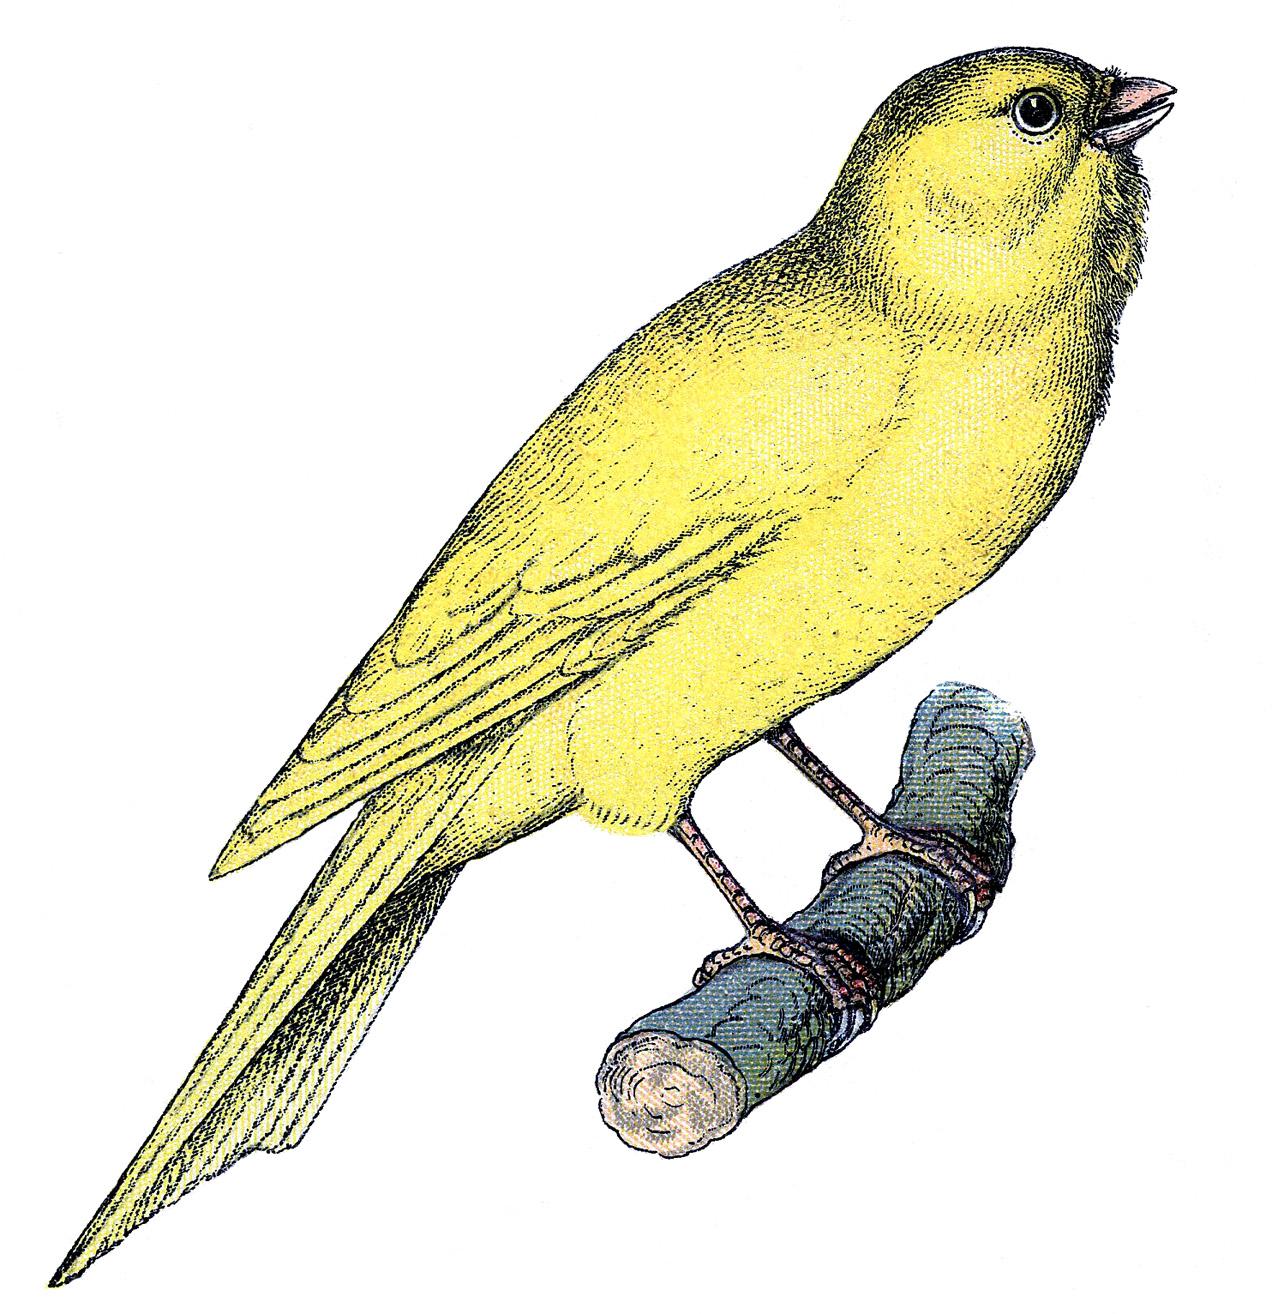 Canary Bird on Branch